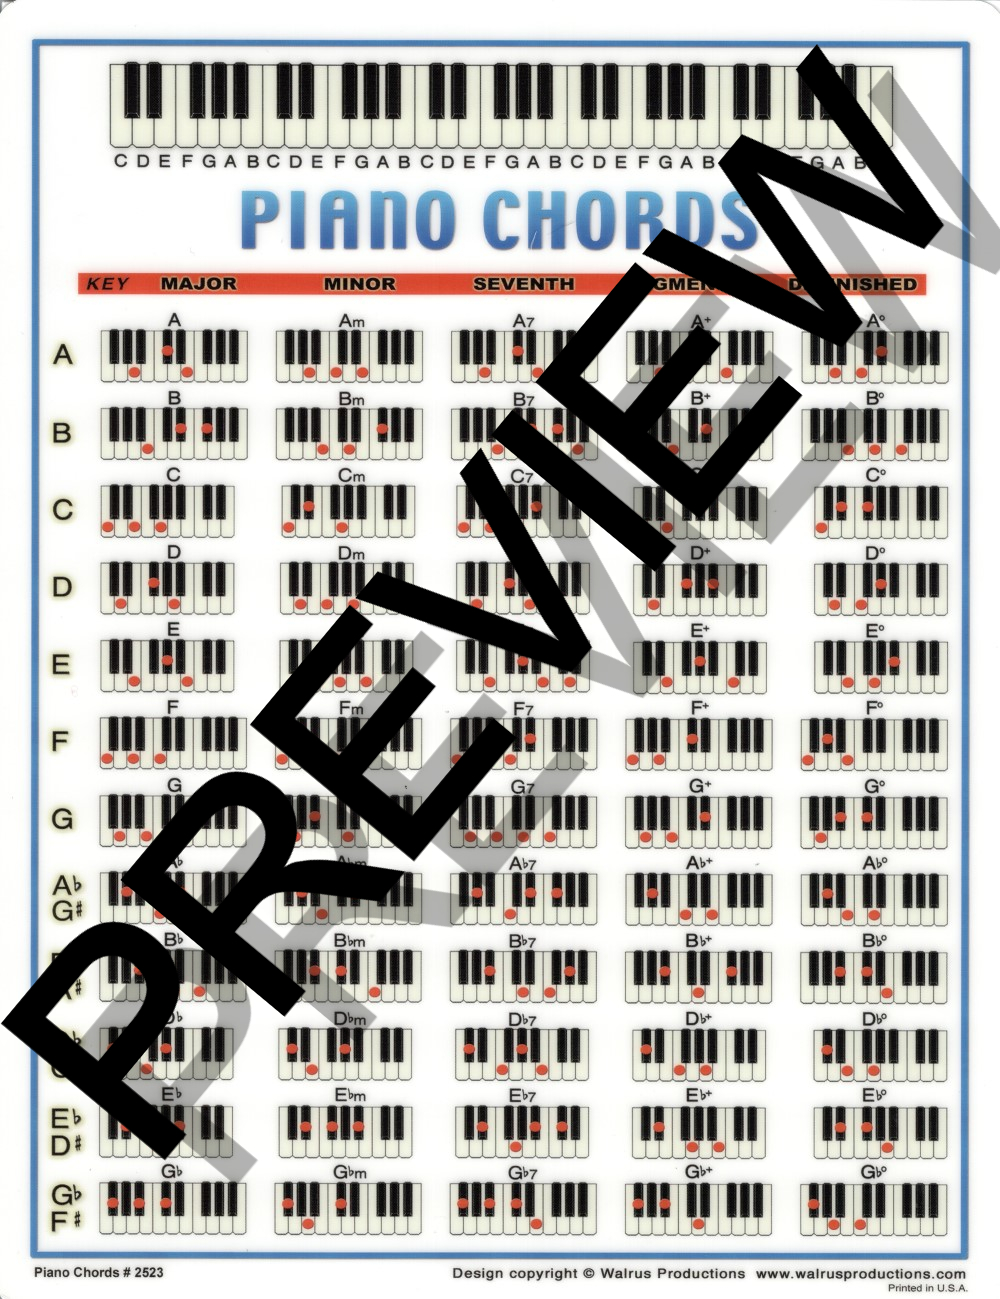 Walrus Productions 2523 Laminated Piano Chord Mini Chart, 8.5 x 11